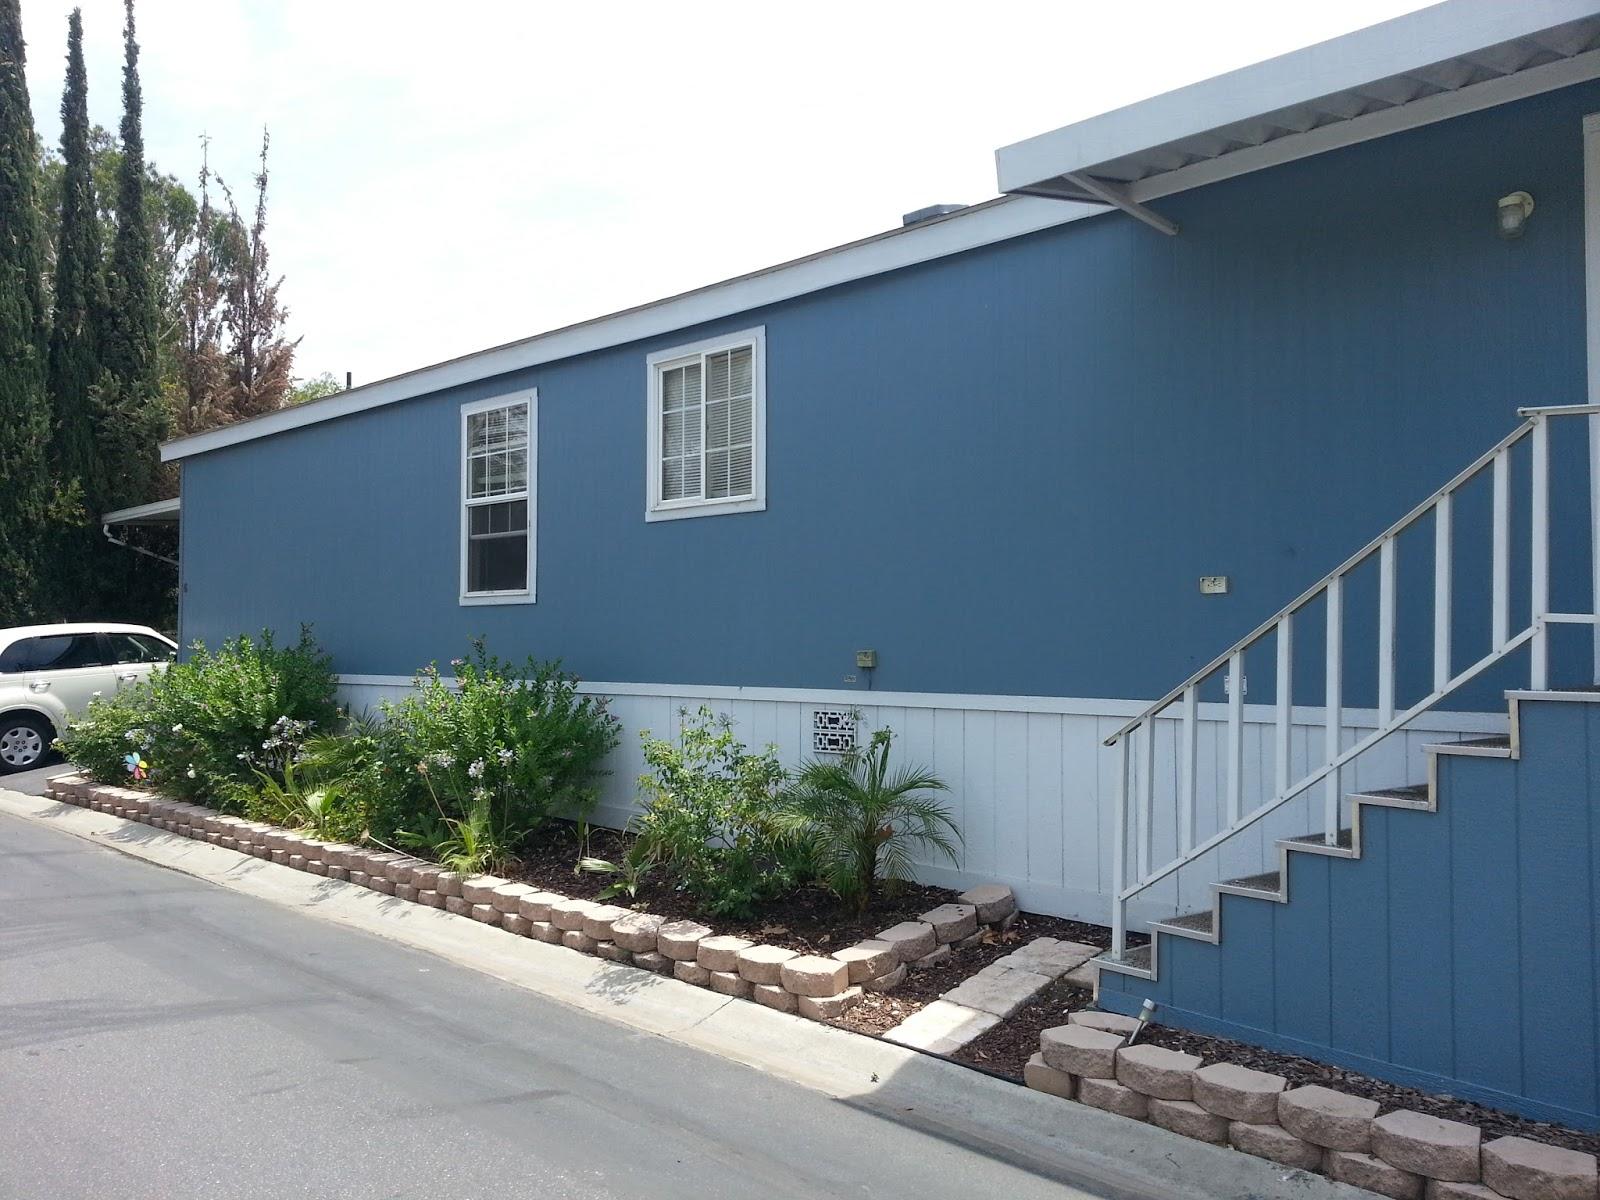 8 beautiful modular homes southern california kelsey bass ranch 9769. Black Bedroom Furniture Sets. Home Design Ideas